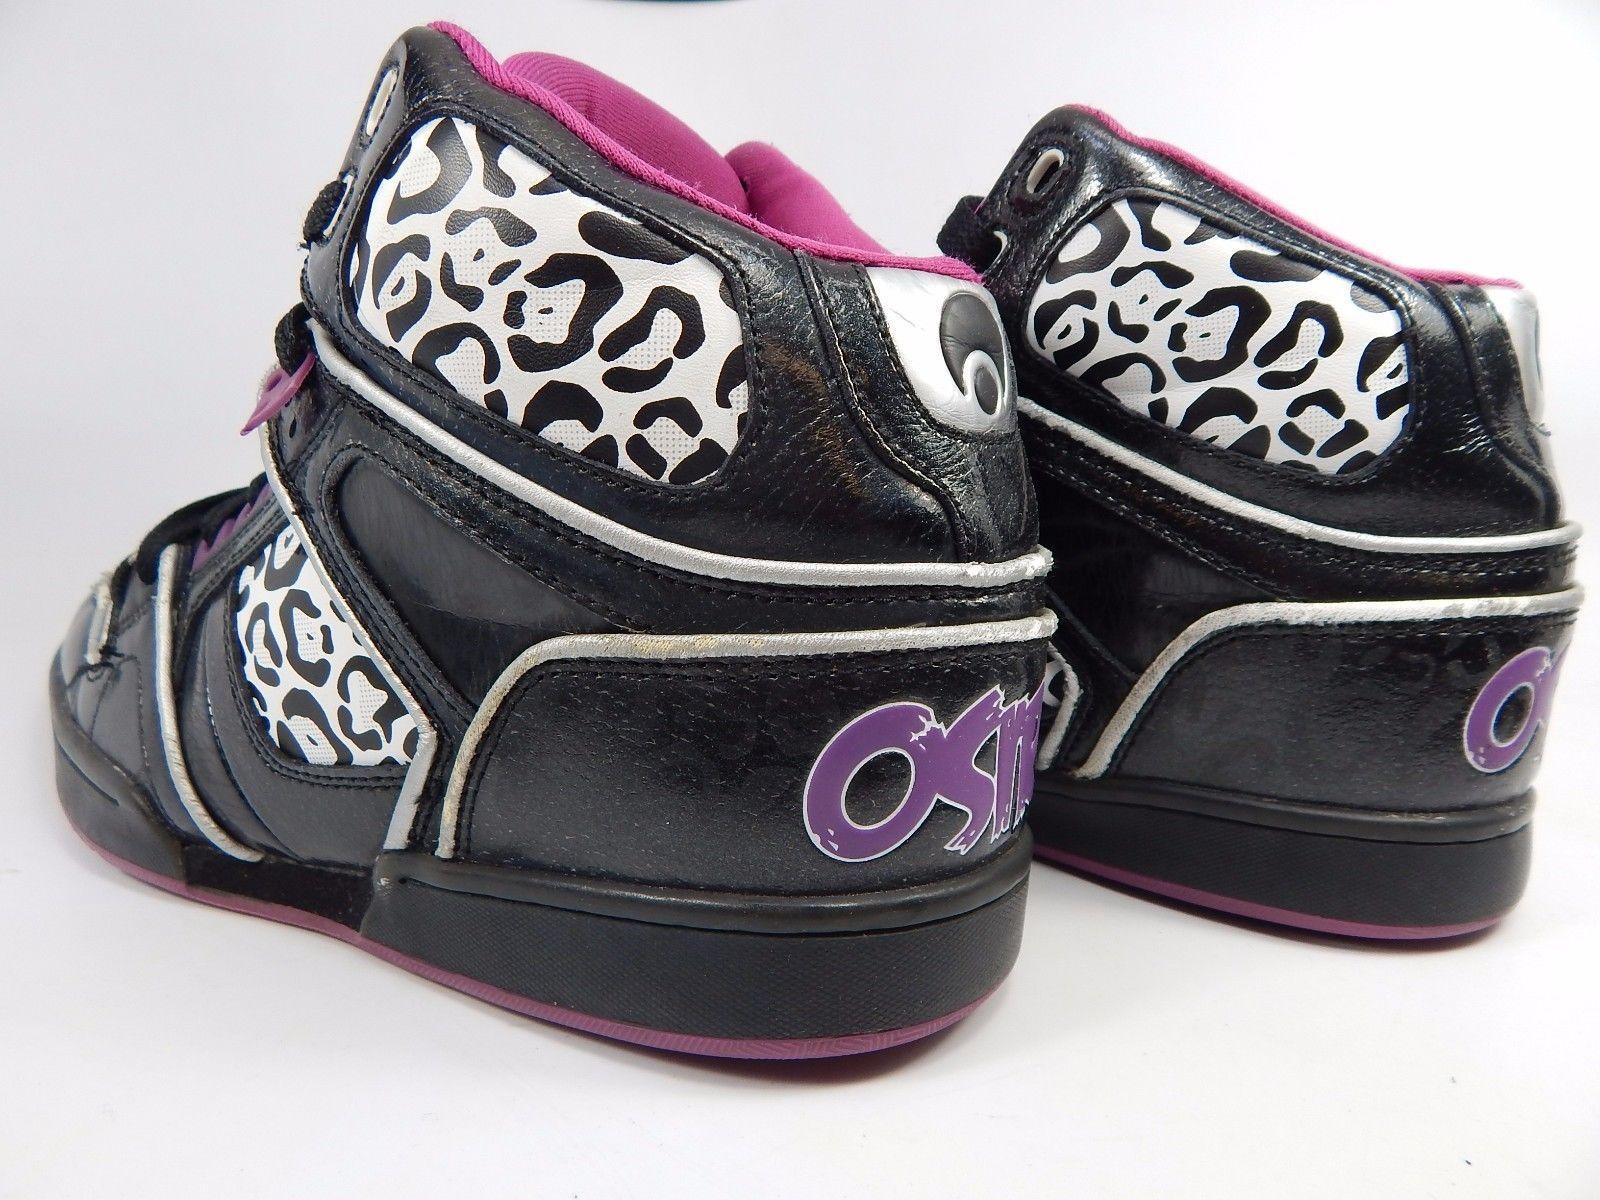 Osiris NYC 83 Slim Ultra Women's Skate Shoes Size US 10  M (B) EU 41.5 SLM Black